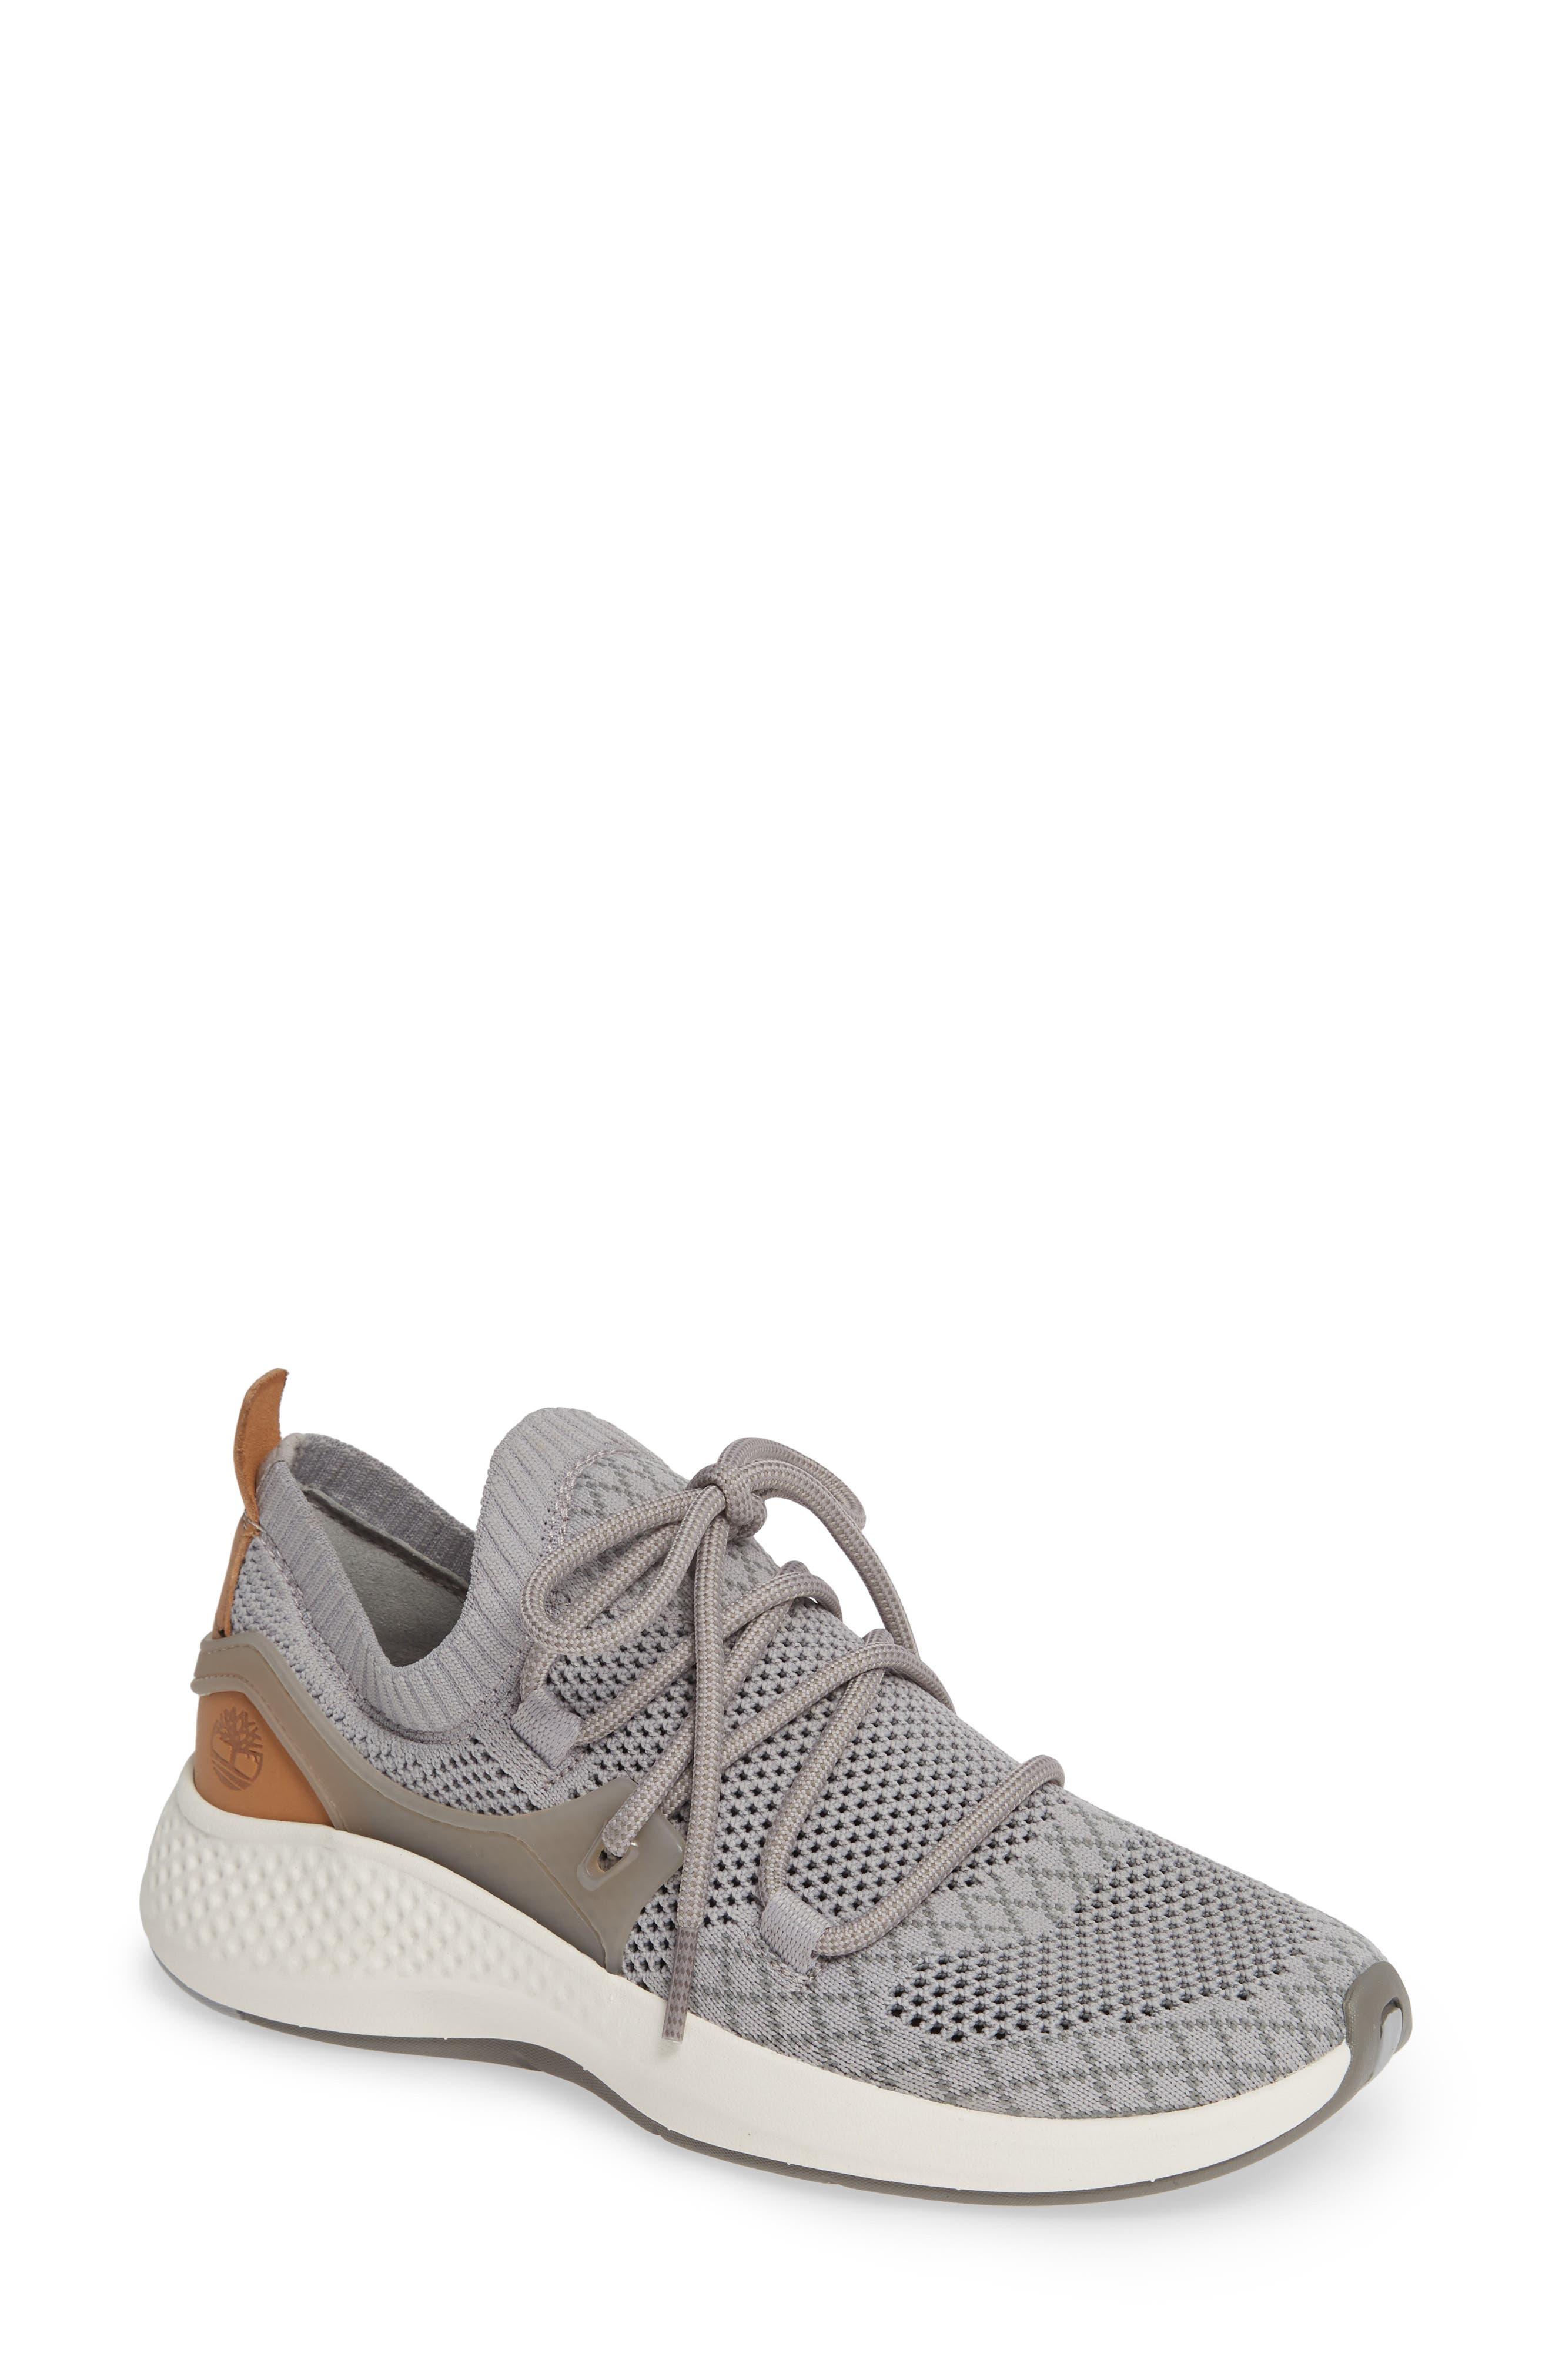 FlyRoam Oxford Sneaker,                         Main,                         color, 065